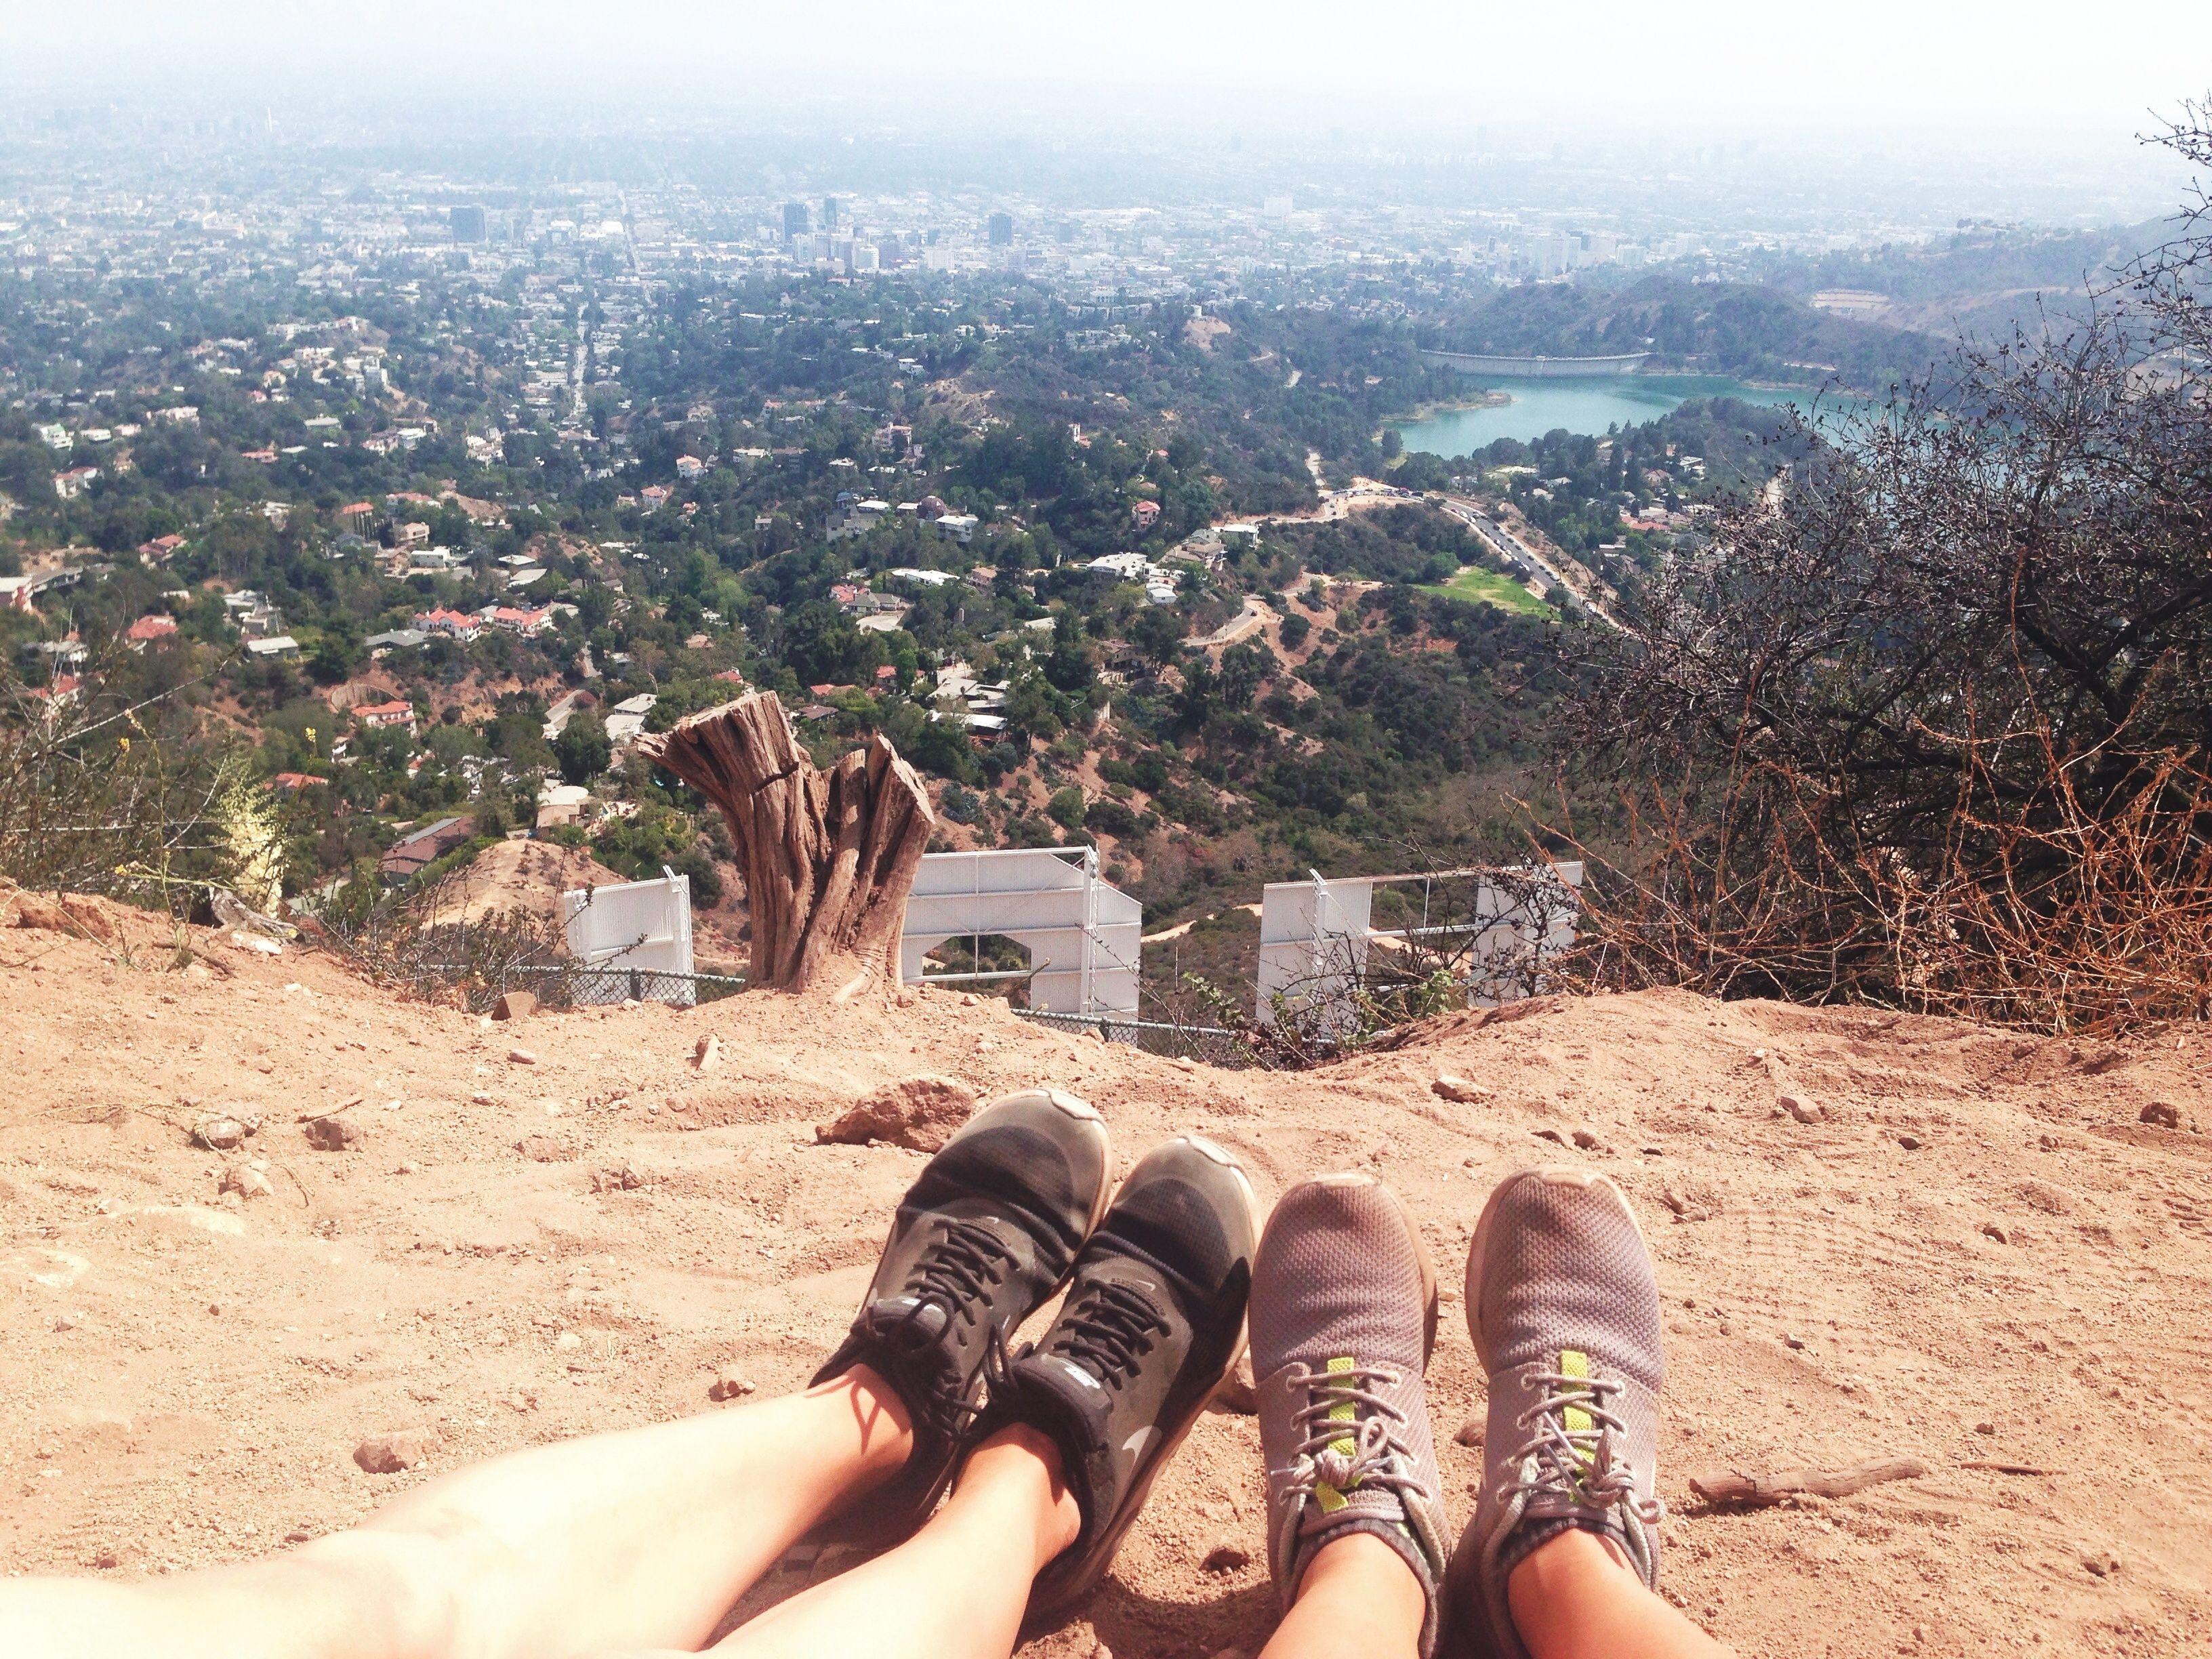 Footprint . Hollywood sign